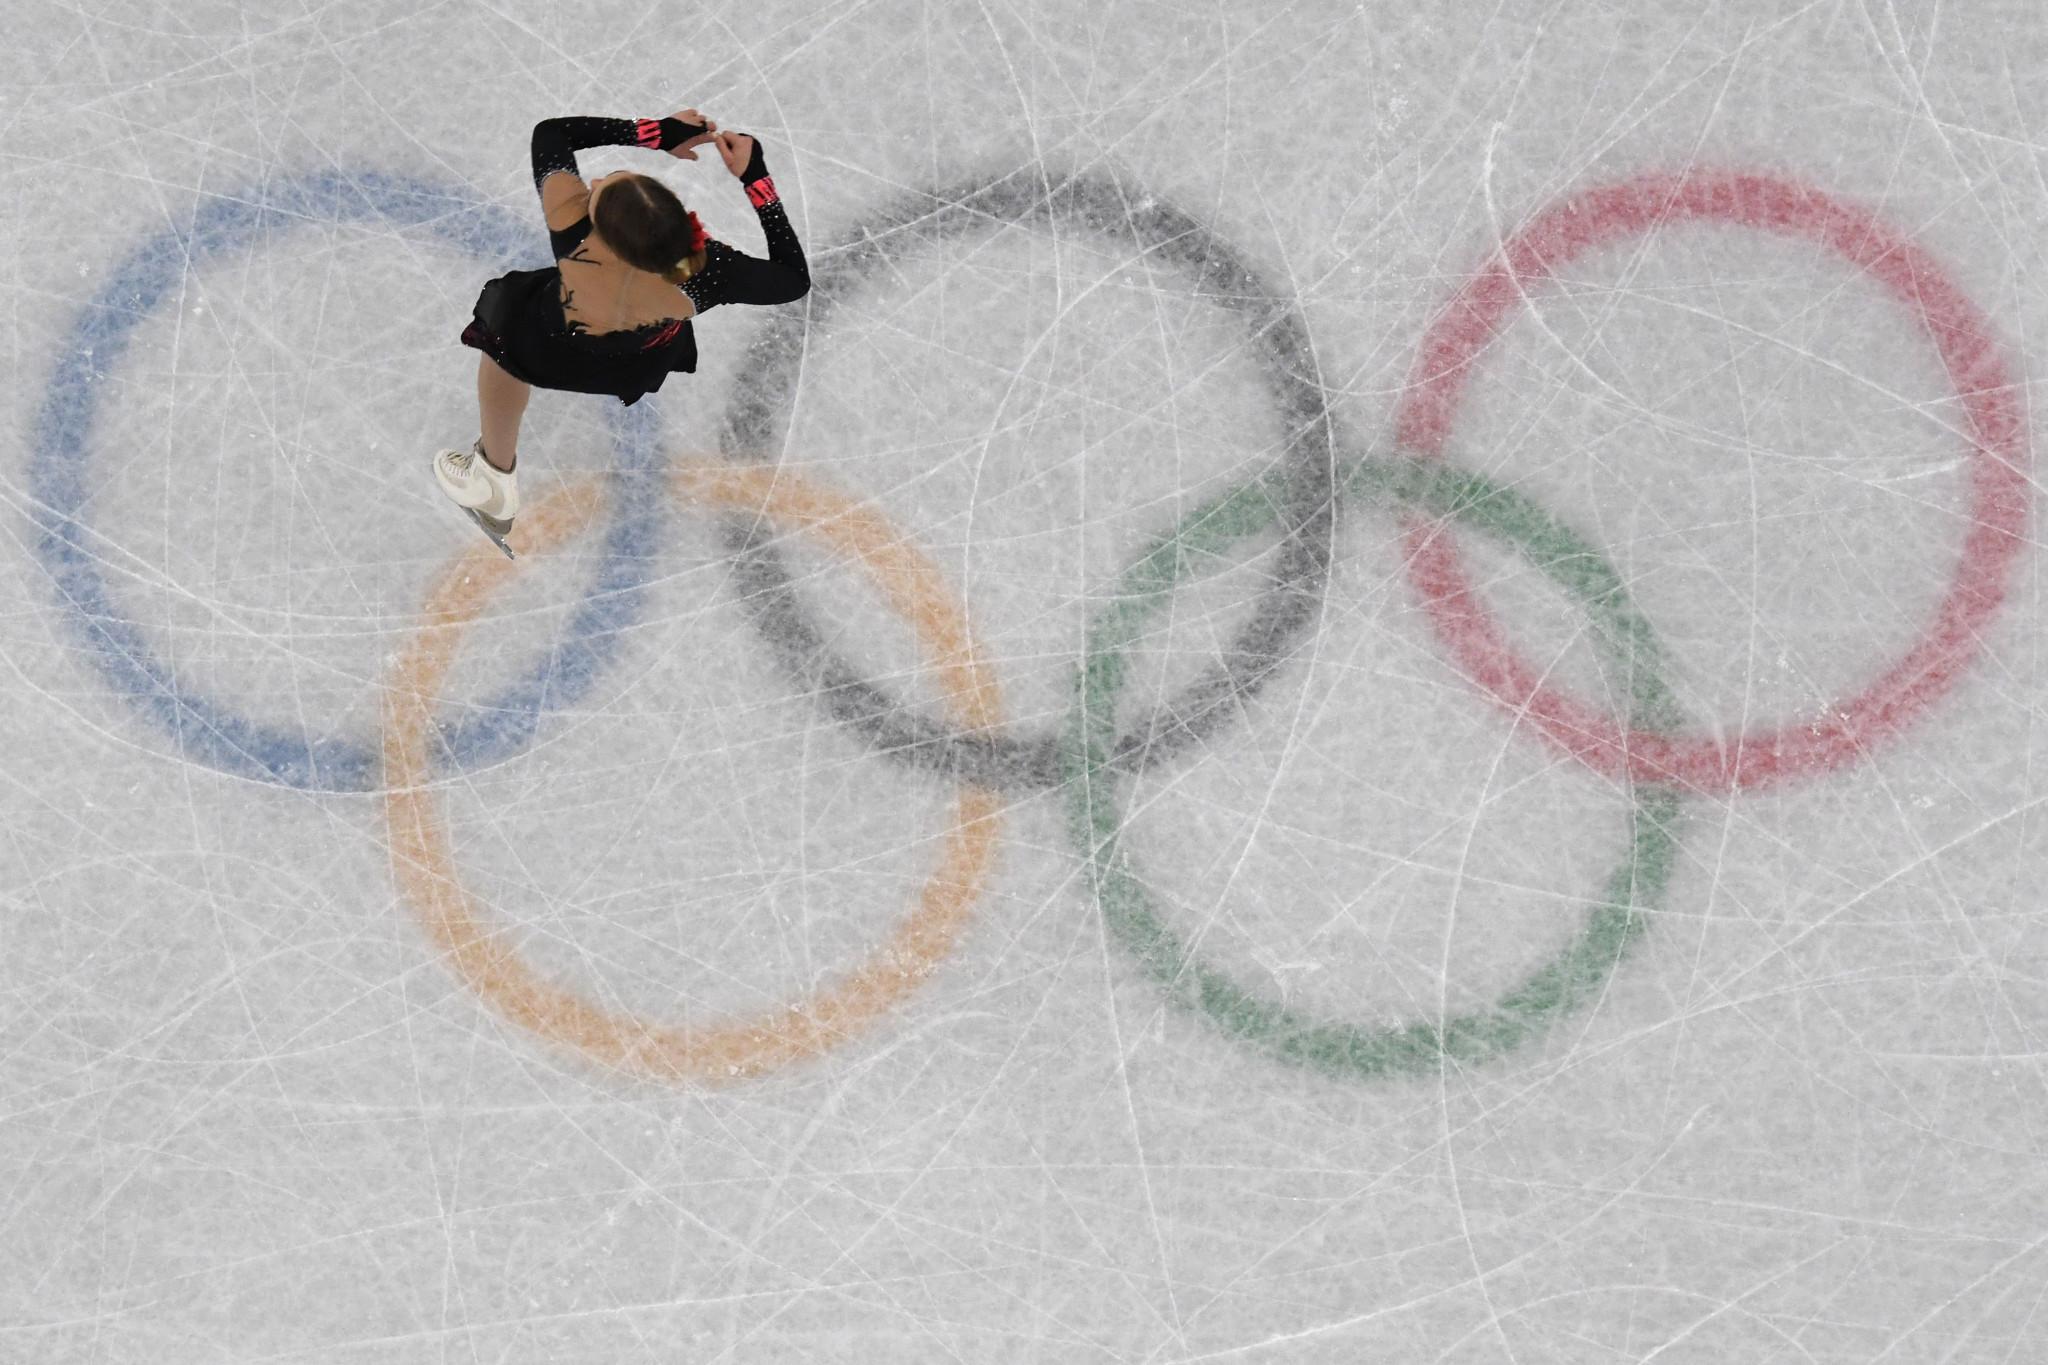 ISU Council grants Portugal provisional speed skating membership